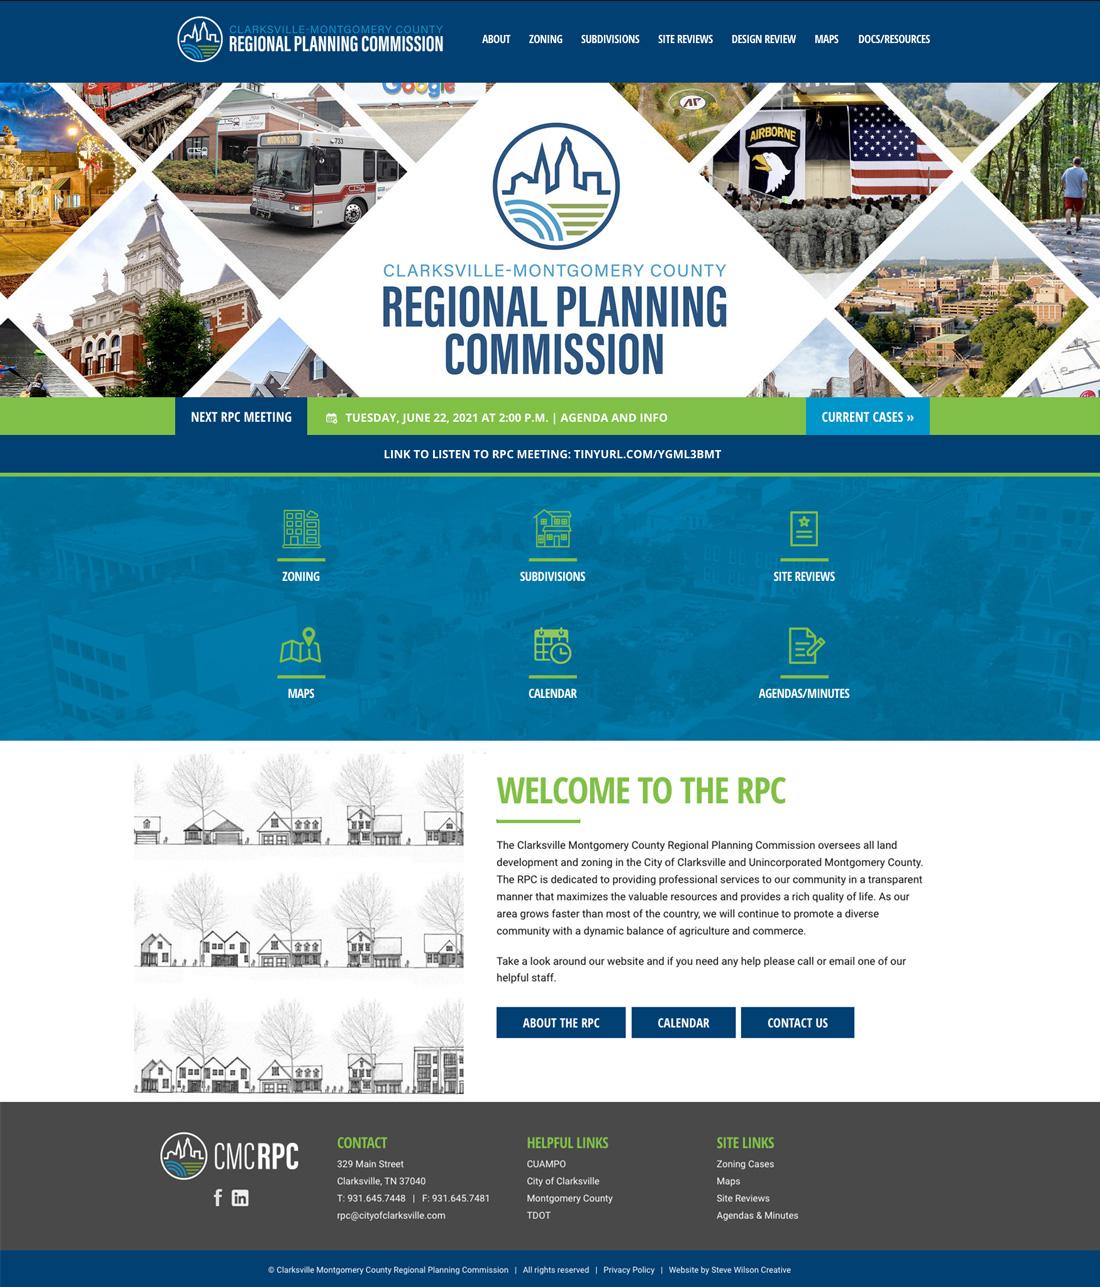 CMCRPC website